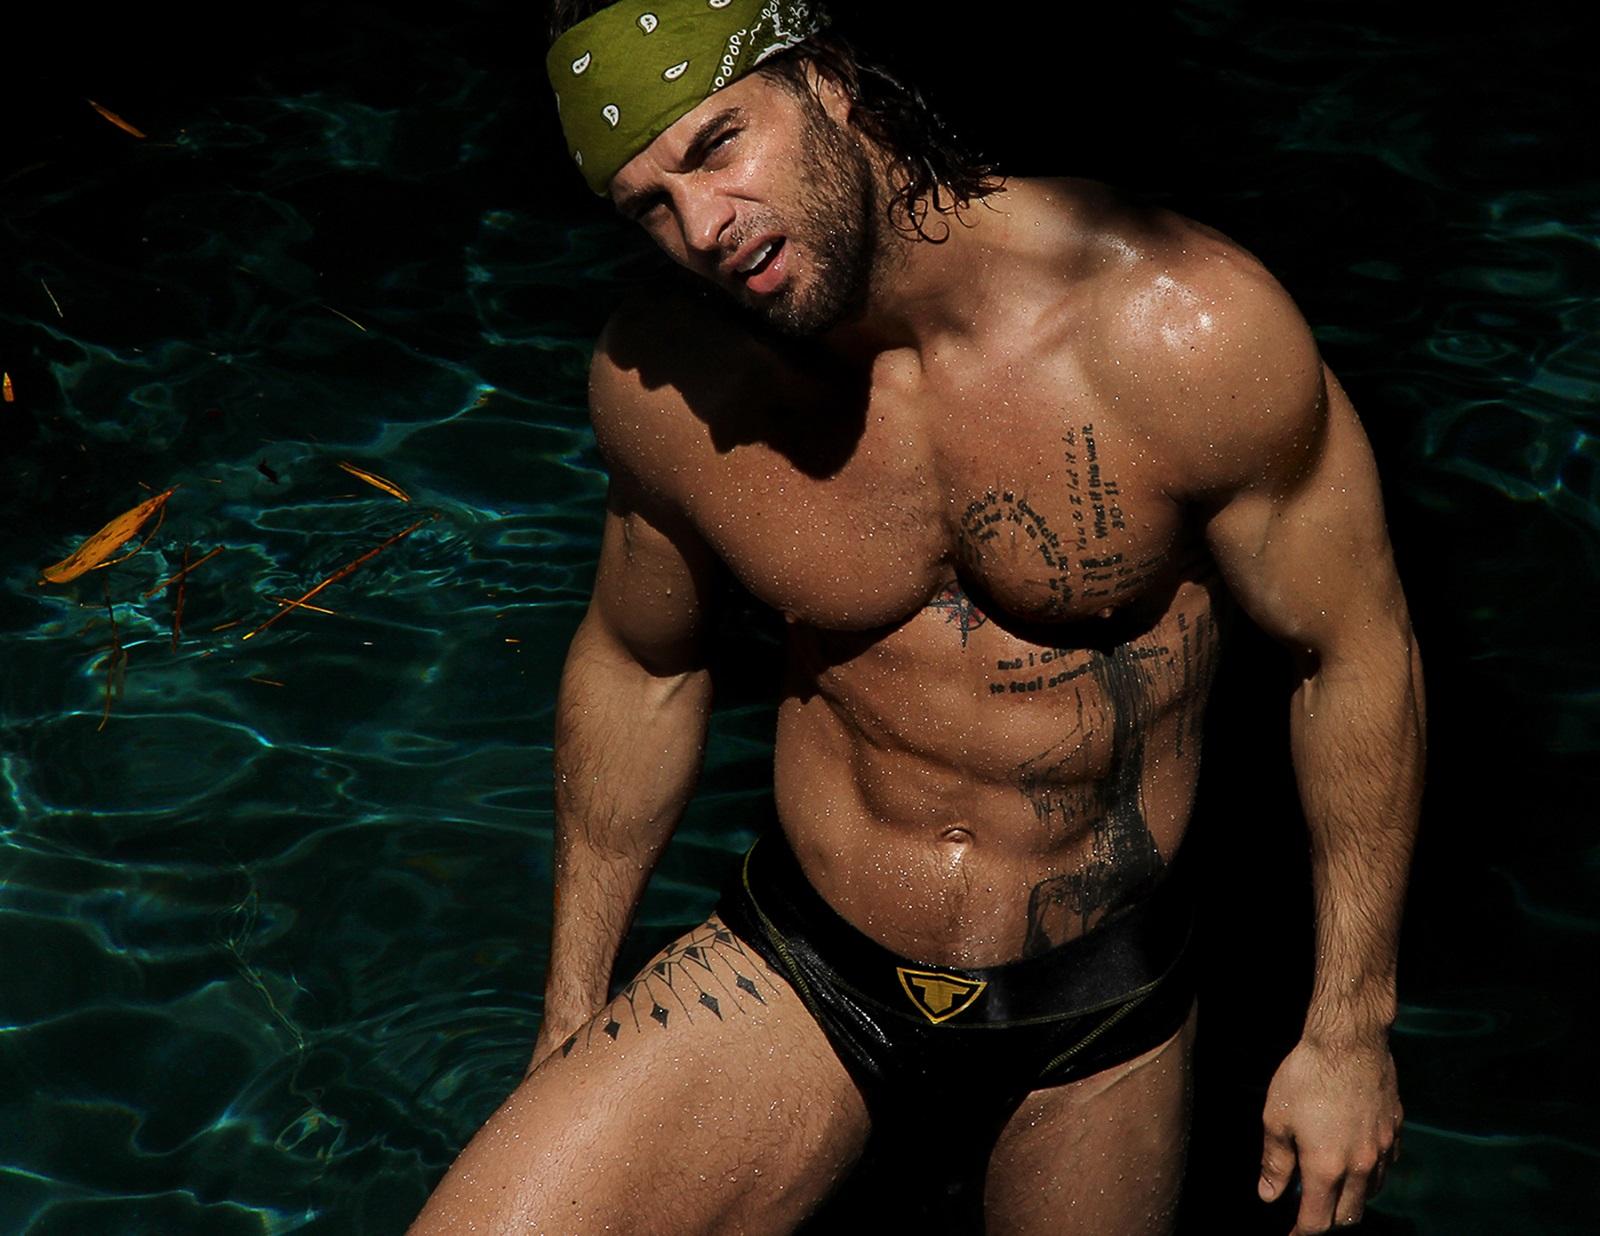 Thierry pepin nude